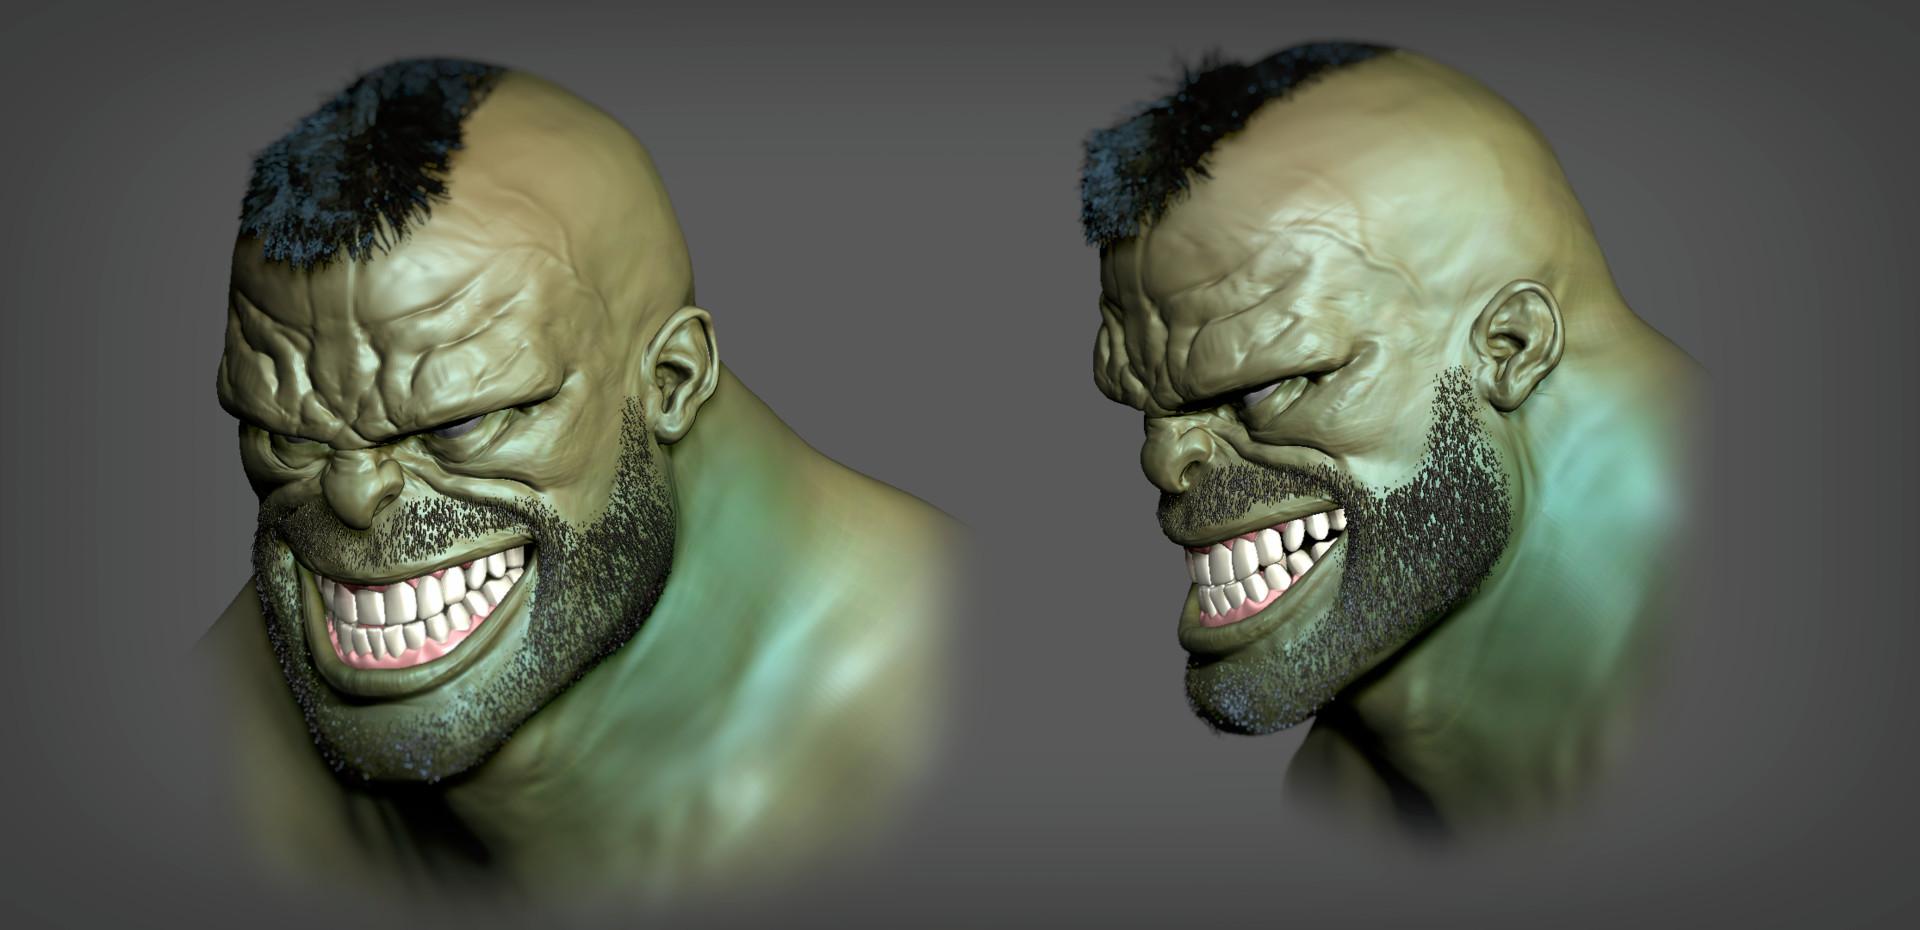 Pierre benjamin hulk test render02777777